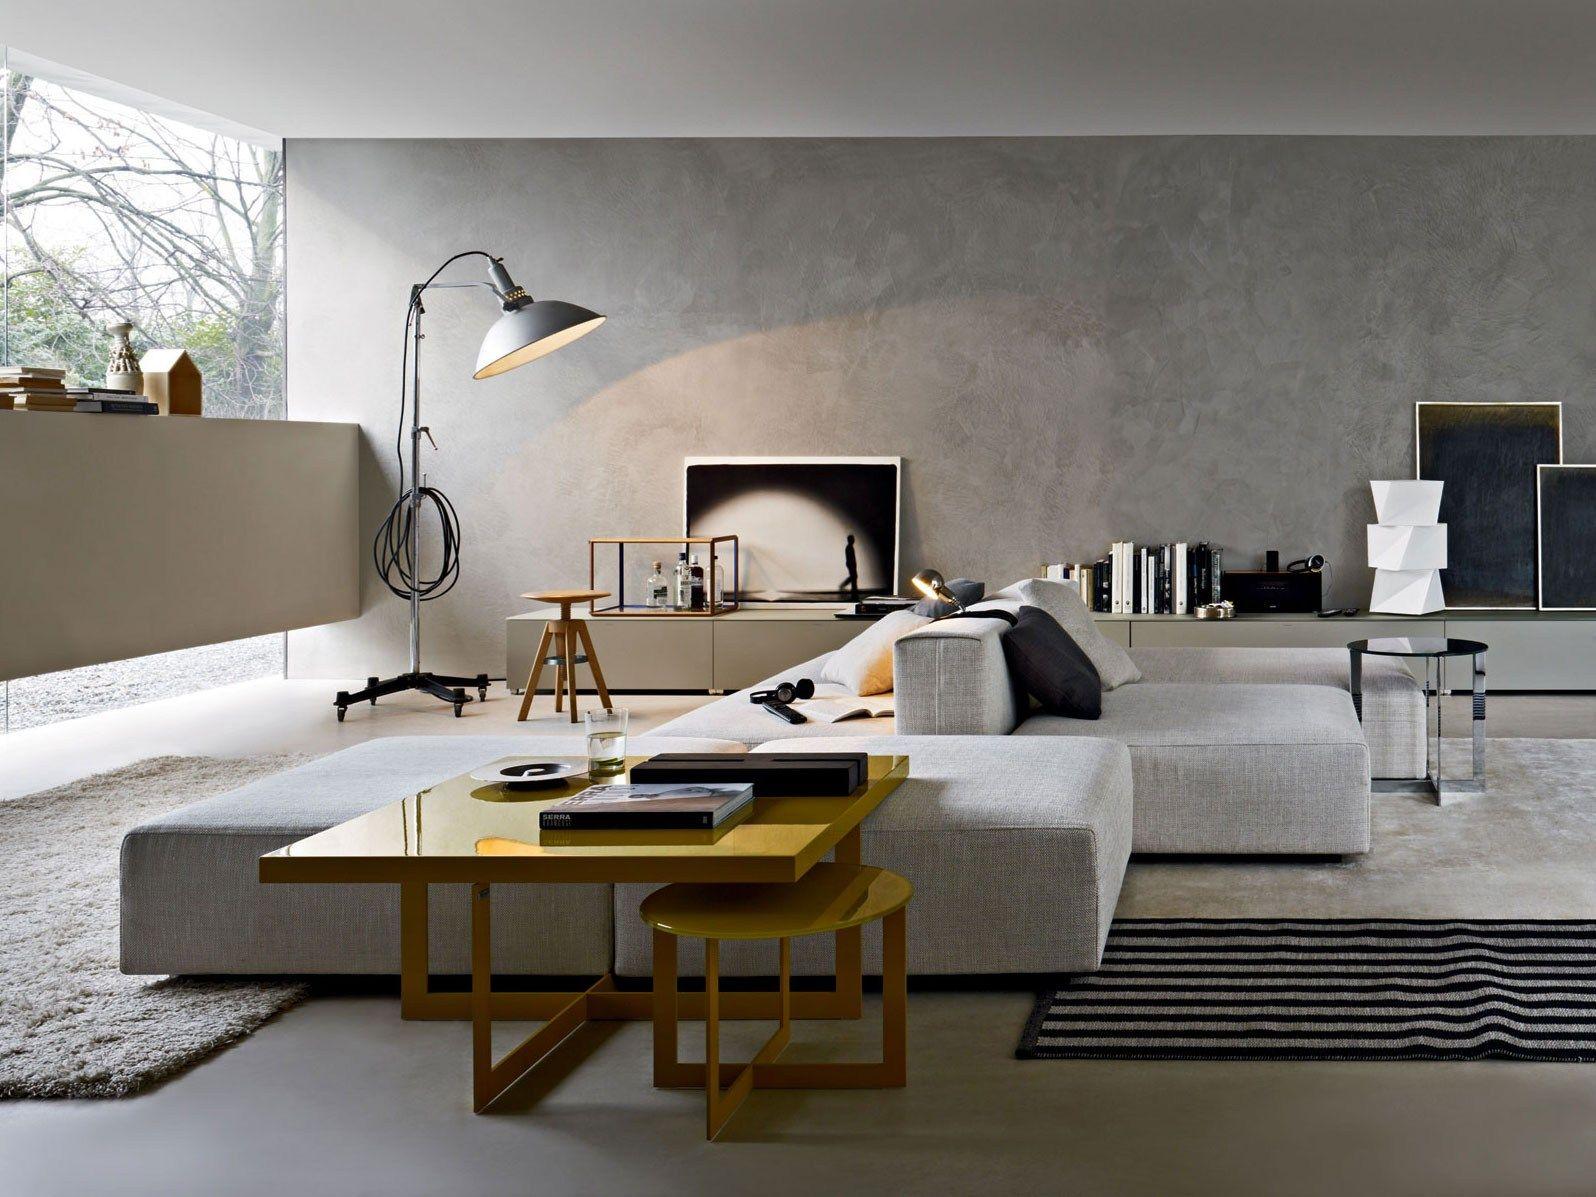 Coole bank diy sofa pinterest b nke for Innenarchitektur und raumgestaltung